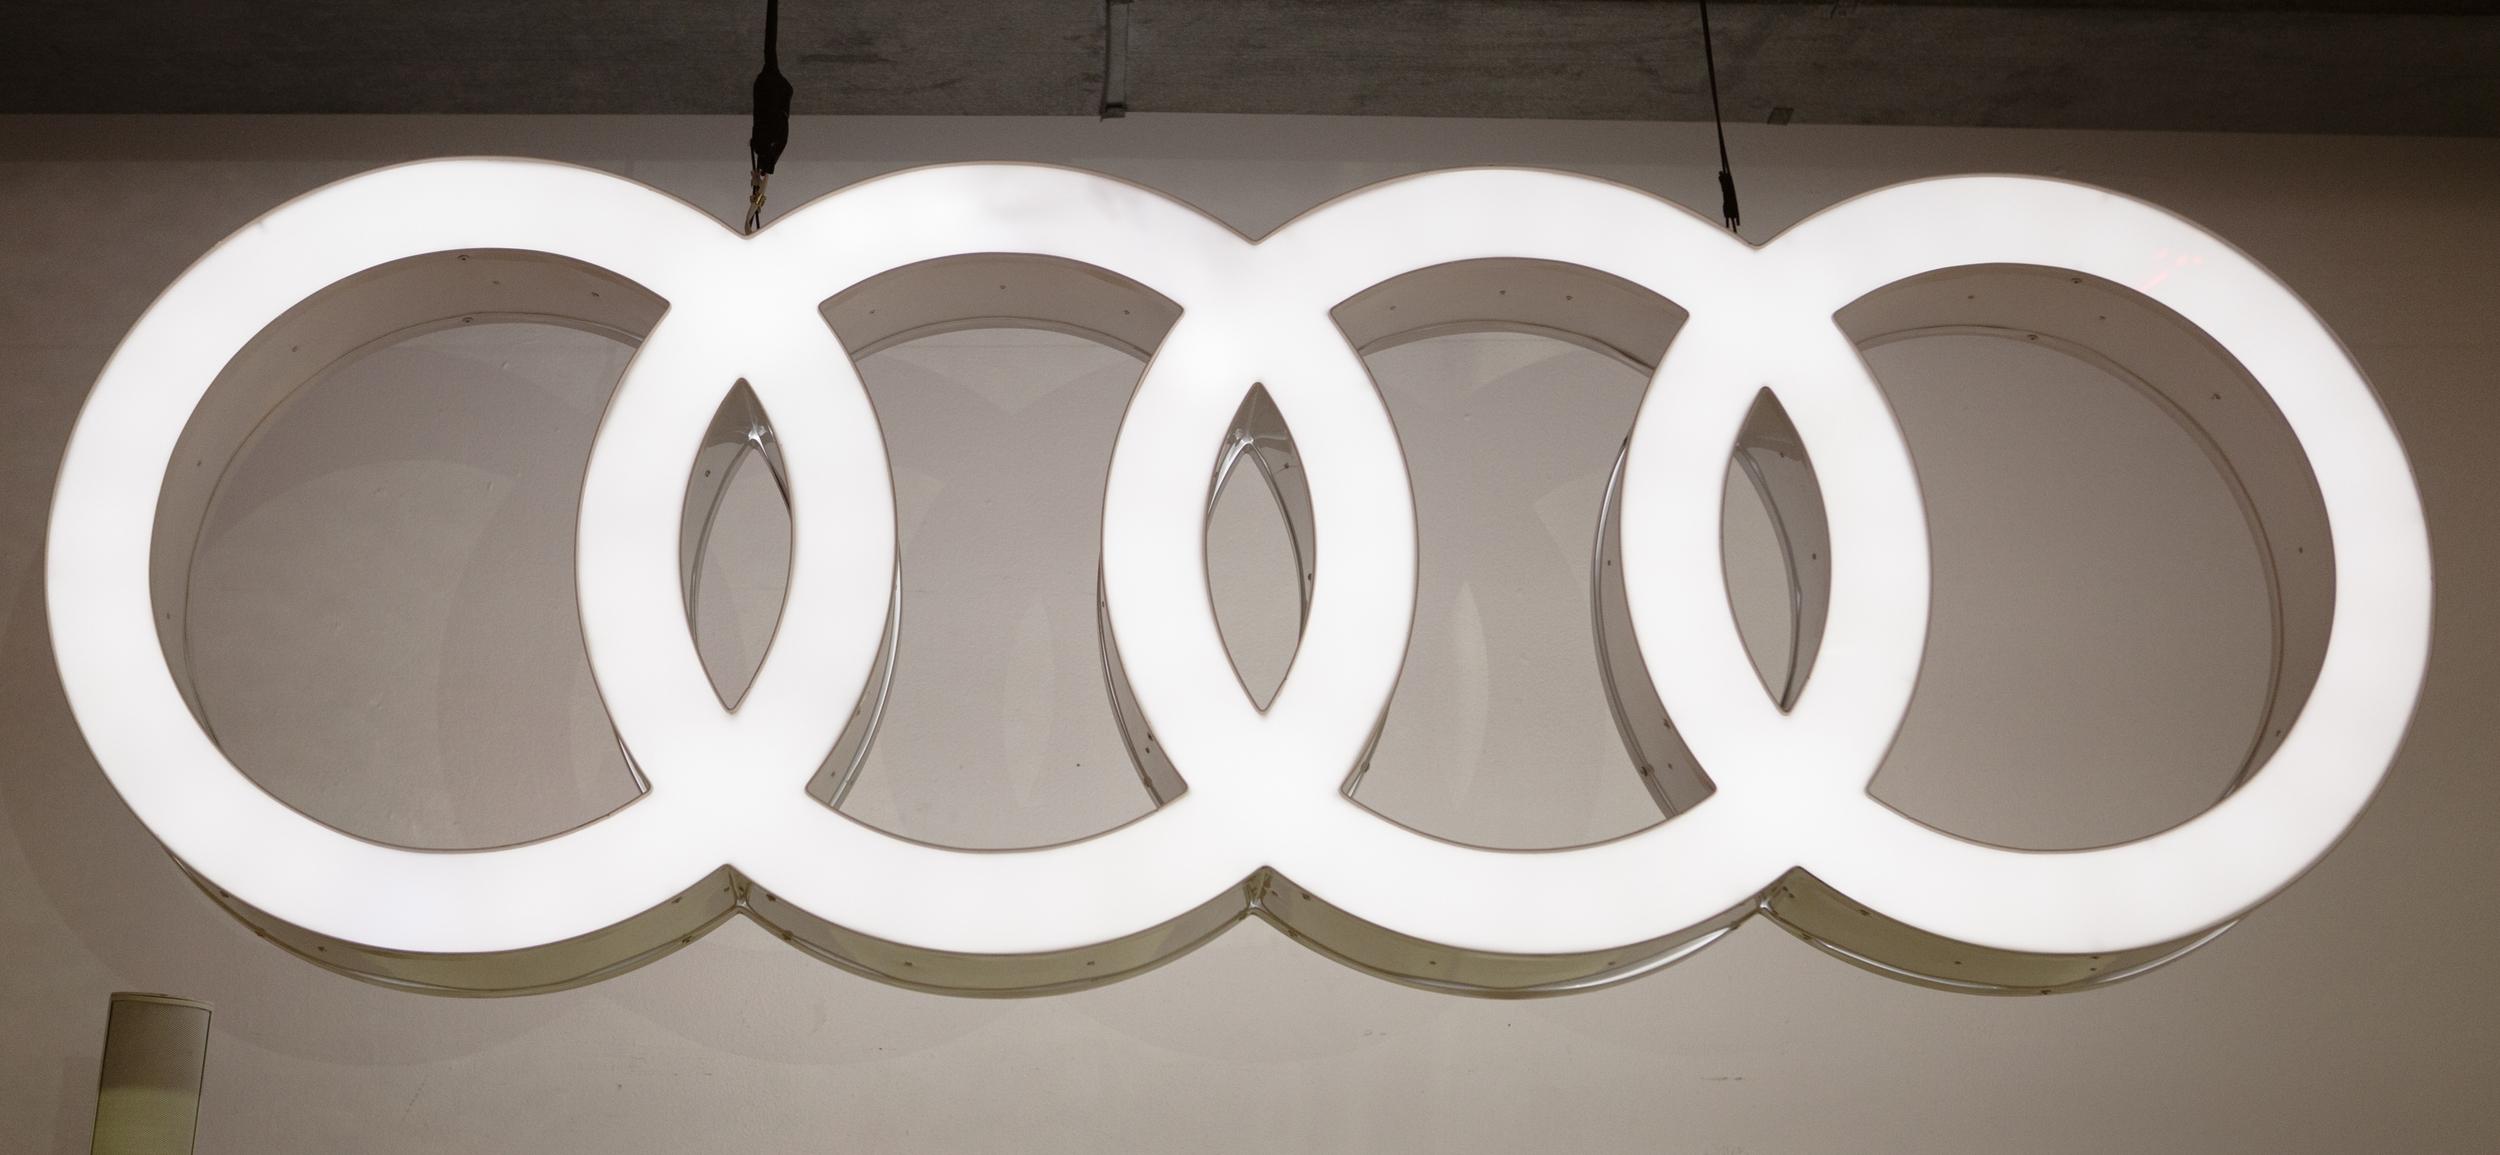 Audi R8 car reveal